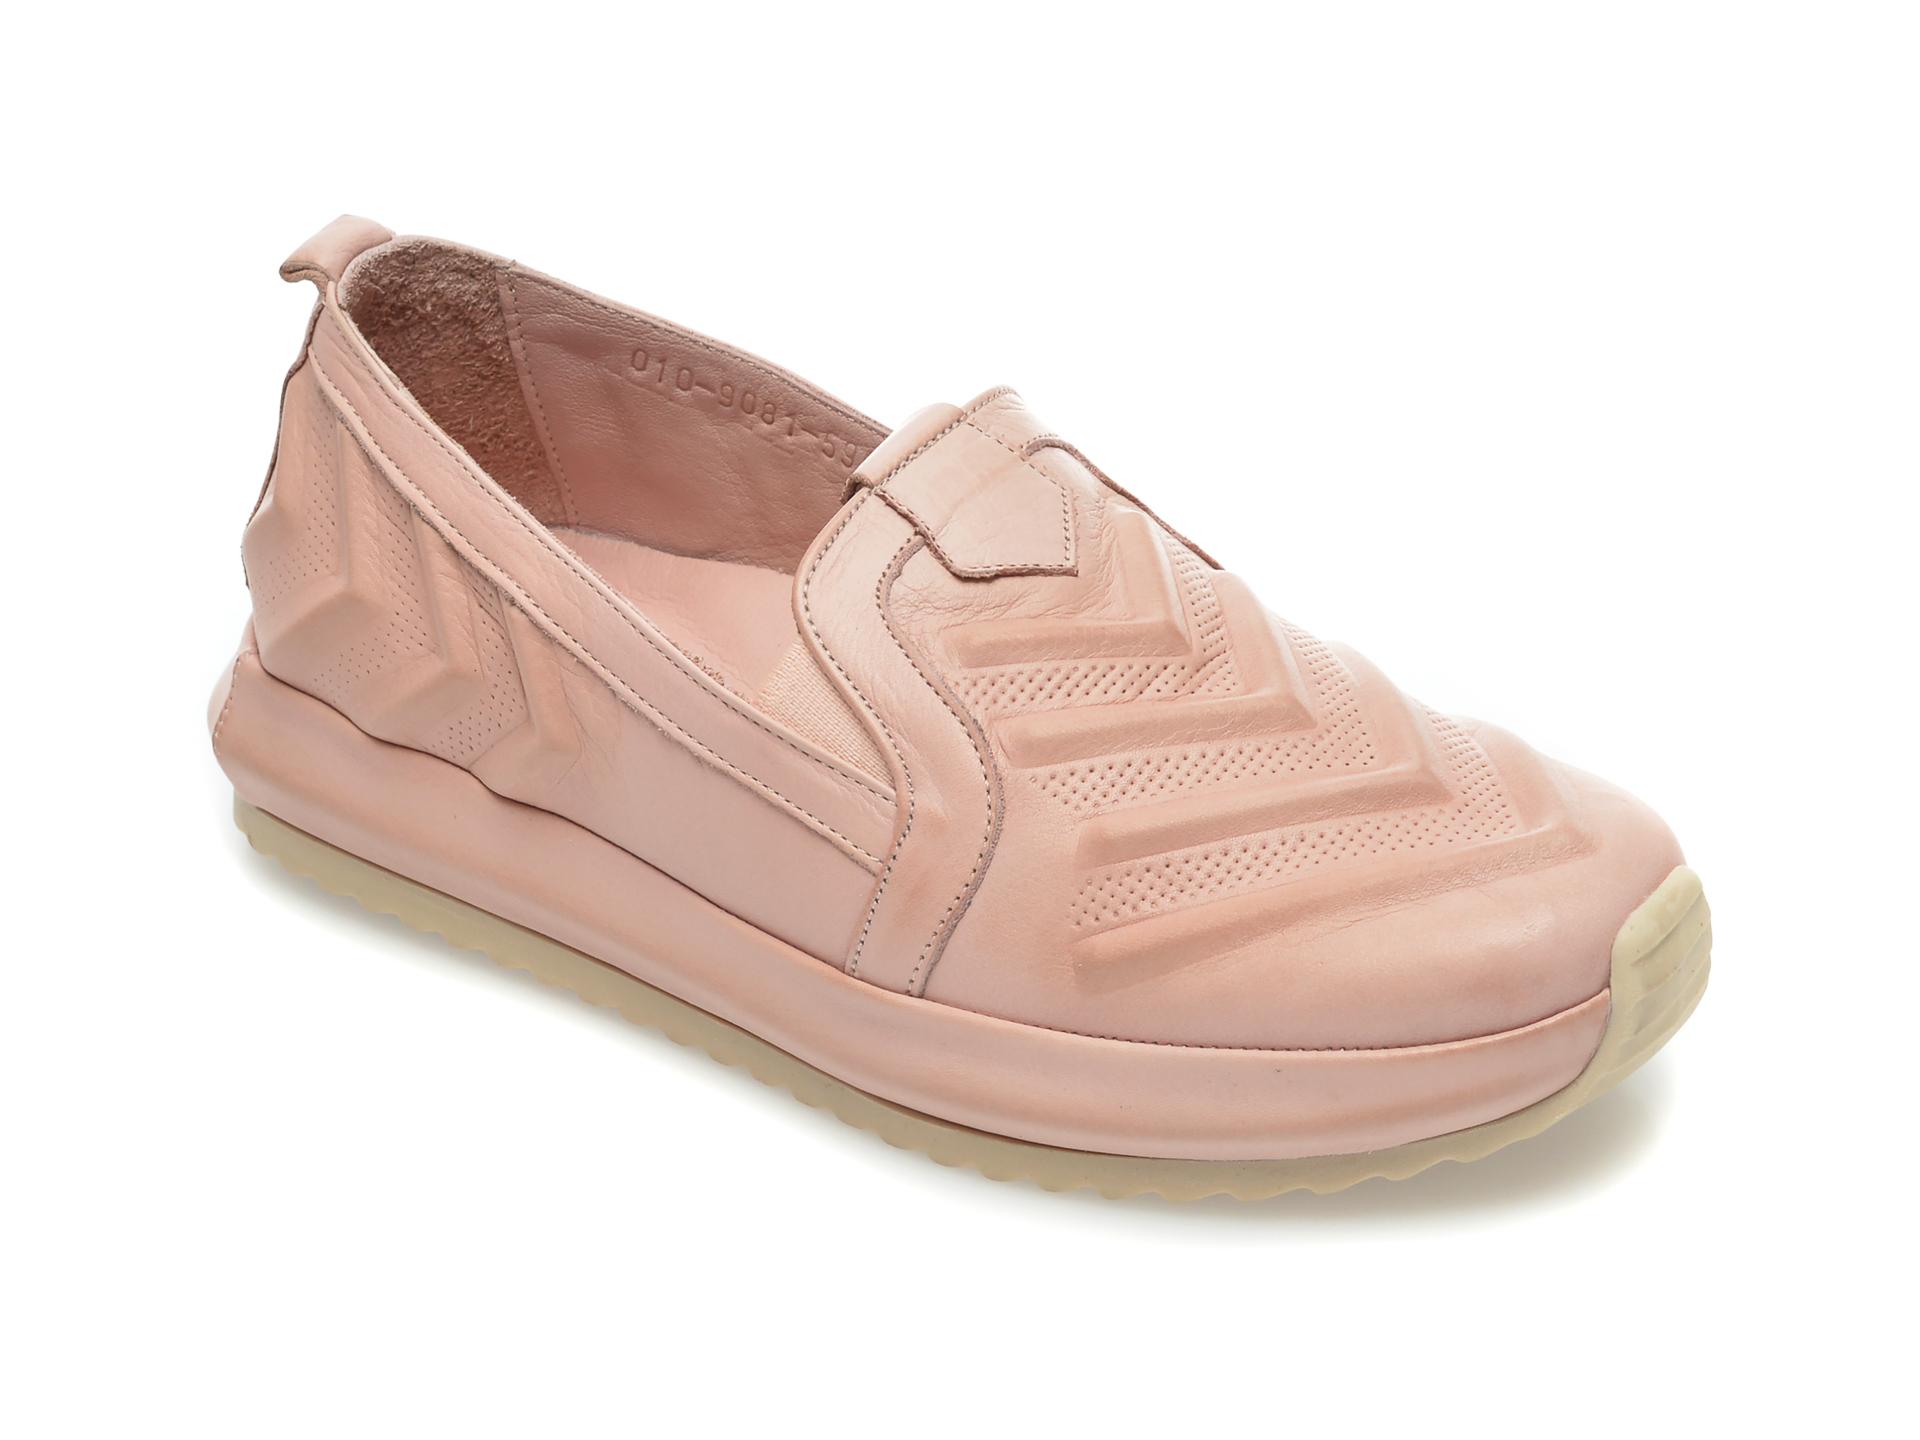 Pantofi FLAVIA PASSINI roz, 109081, din piele naturala New